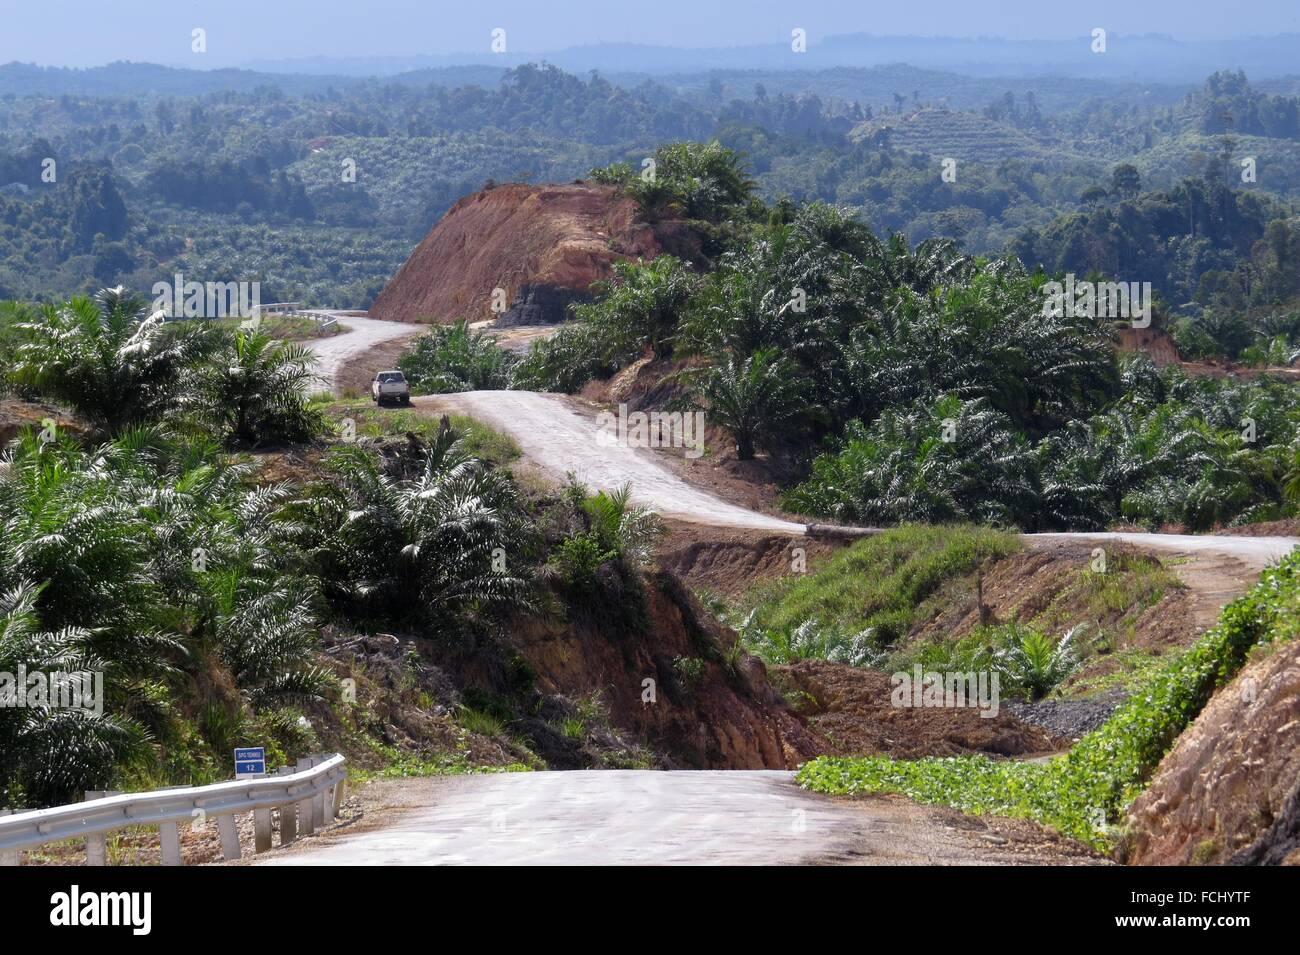 miri marudibaram oil palm estate road sarawak malaysia FCHYTF - What do you know about Palm